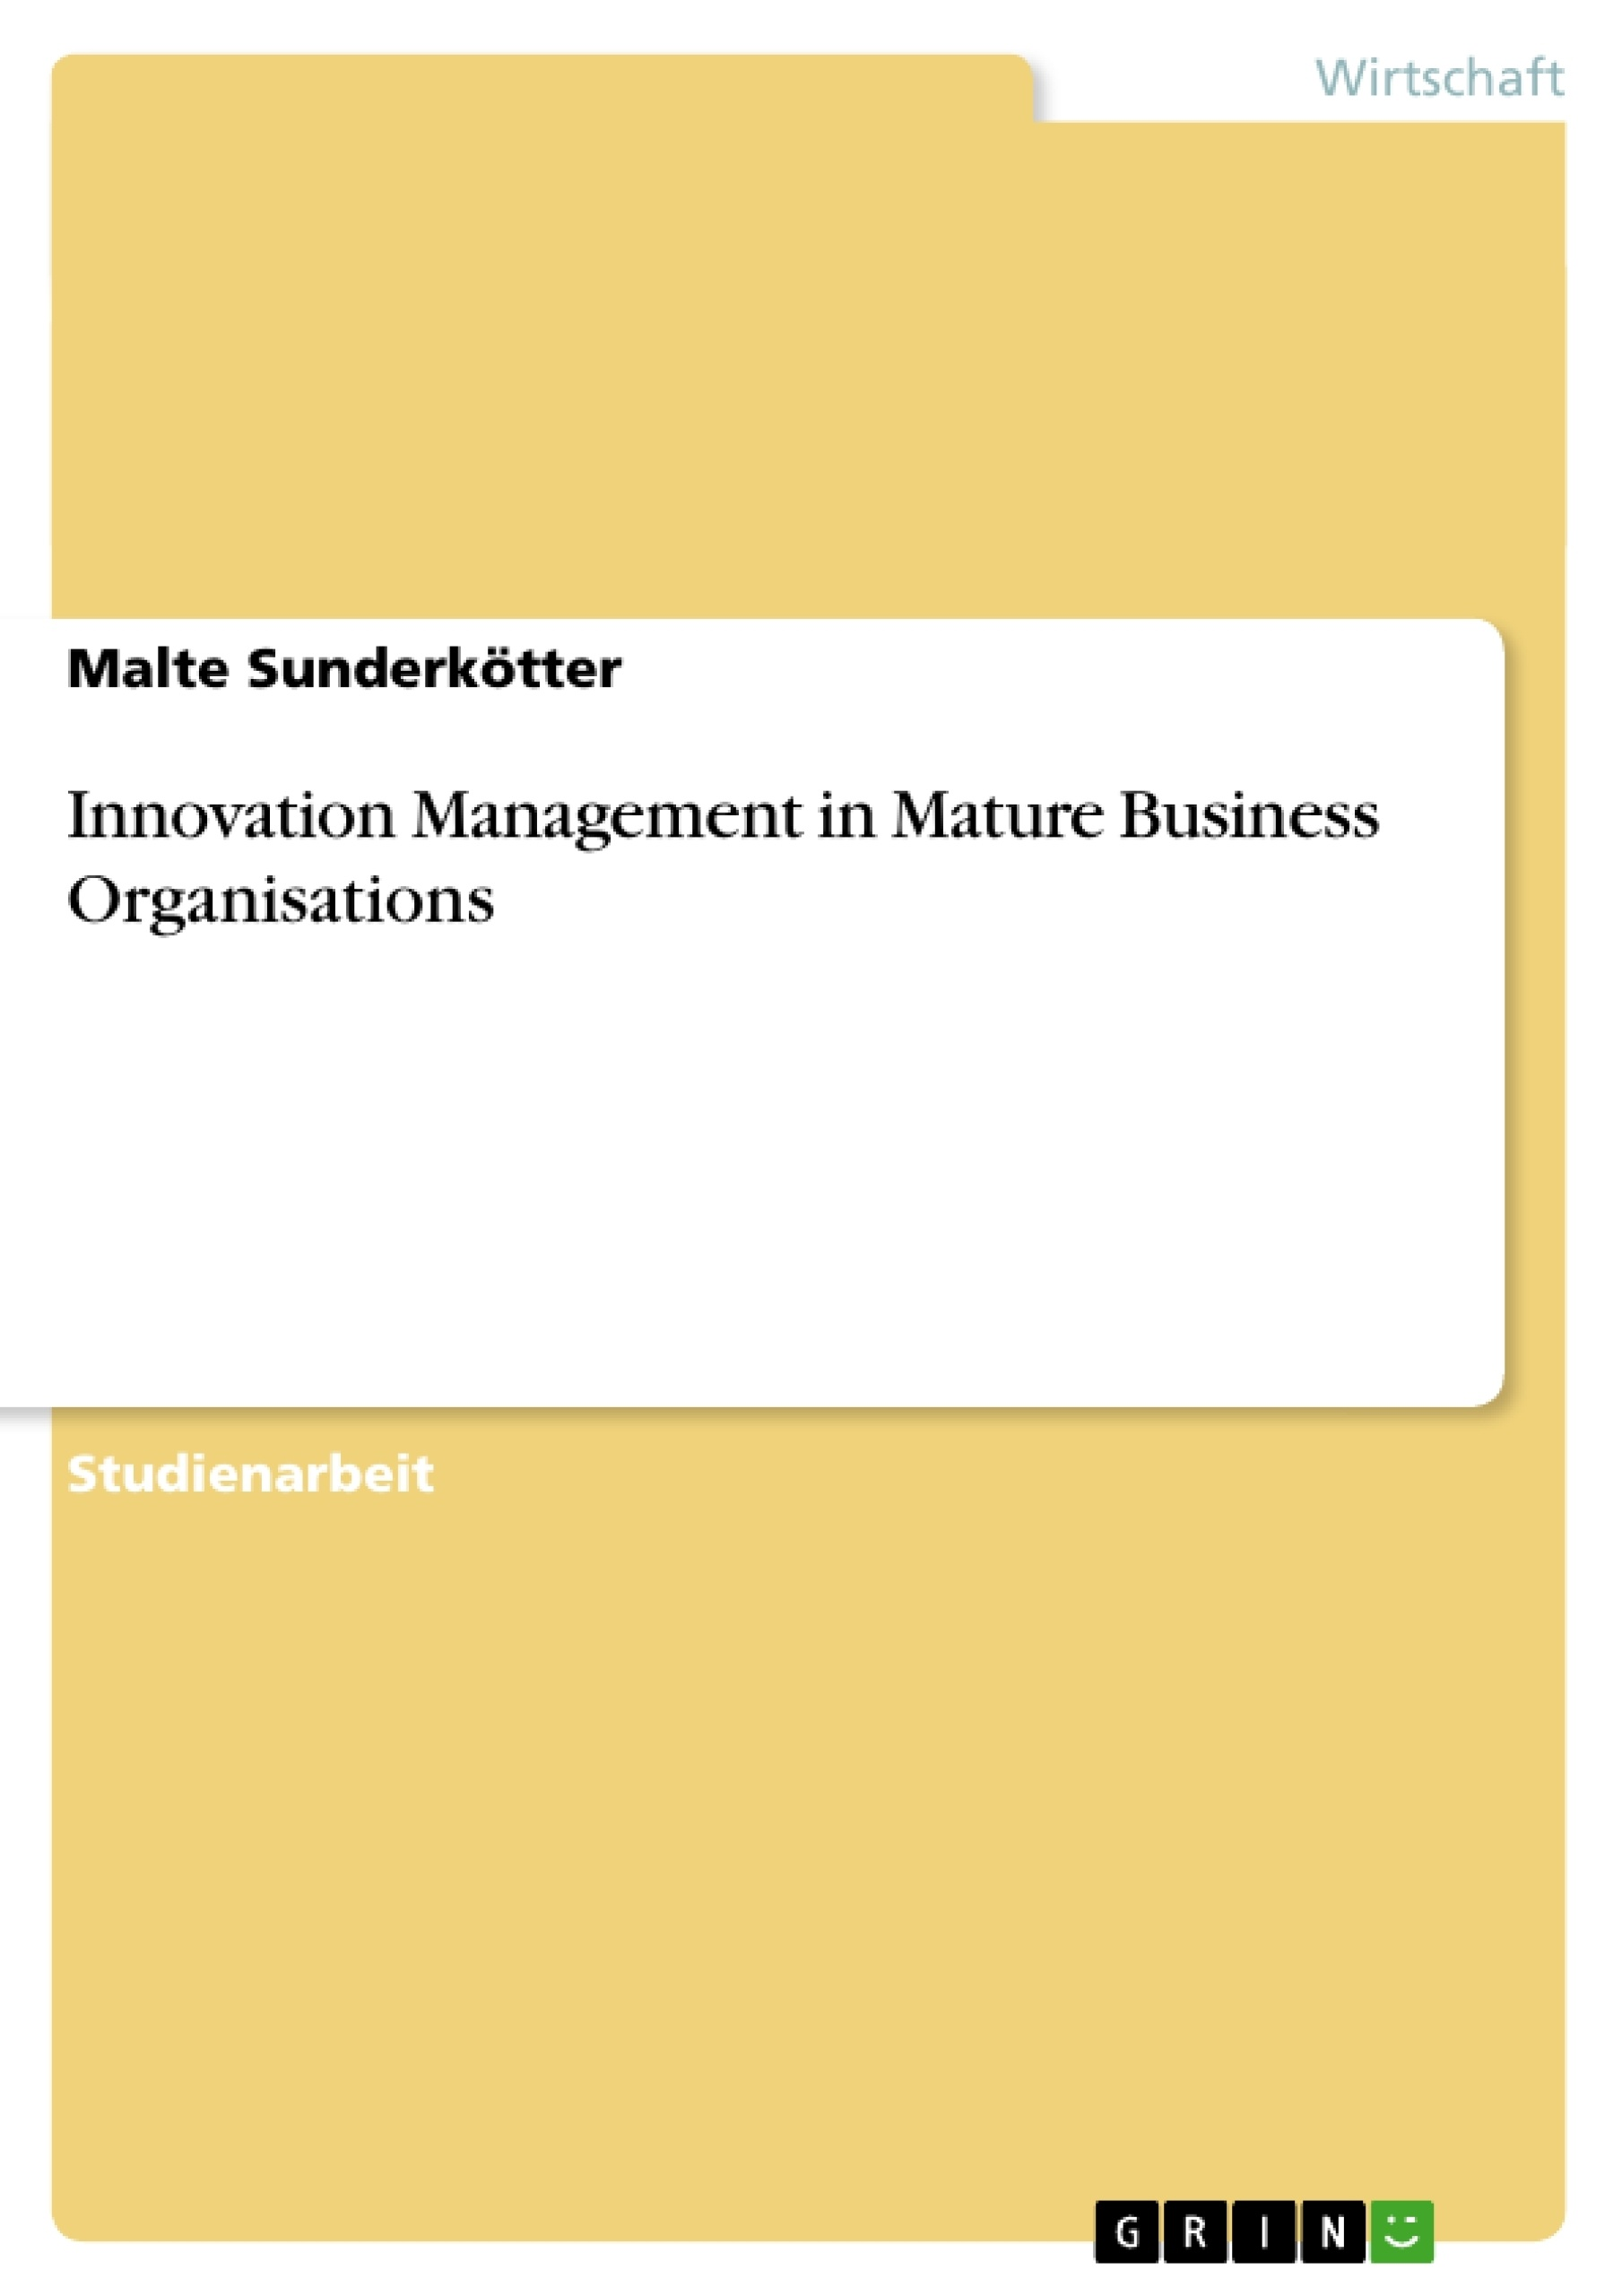 Titel: Innovation Management in Mature Business Organisations